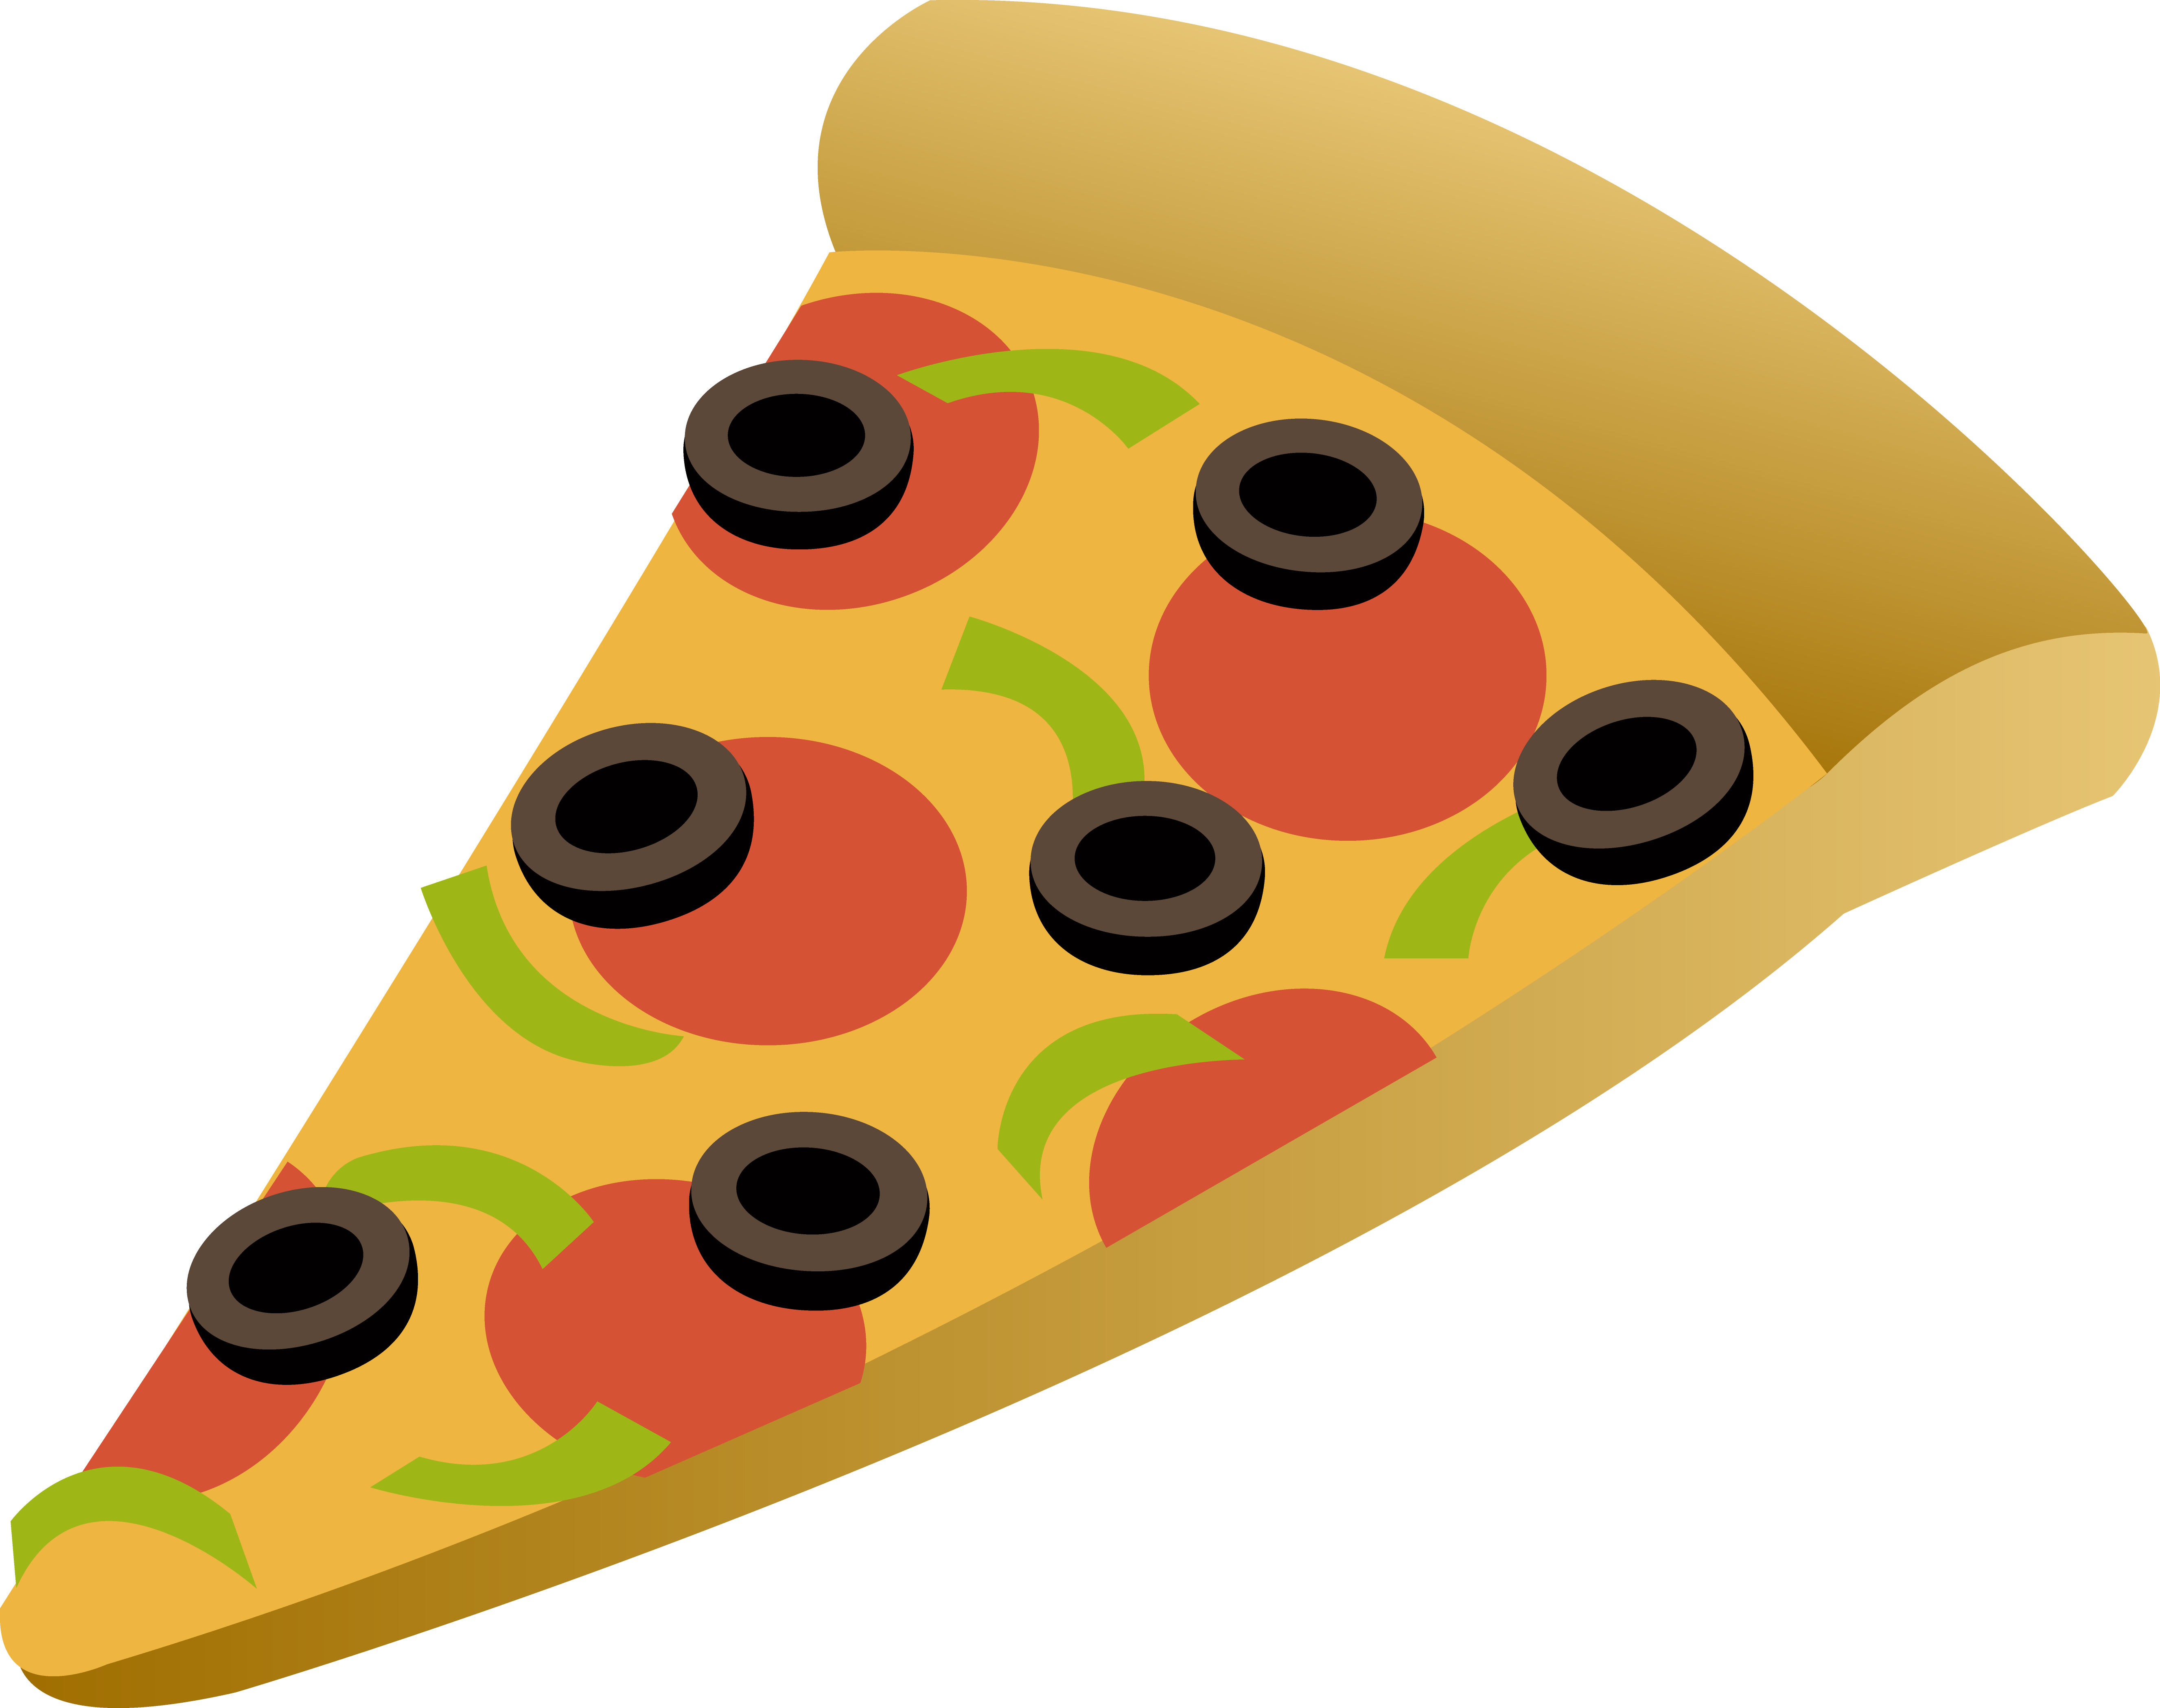 5307x4197 Pizza Clipart 2